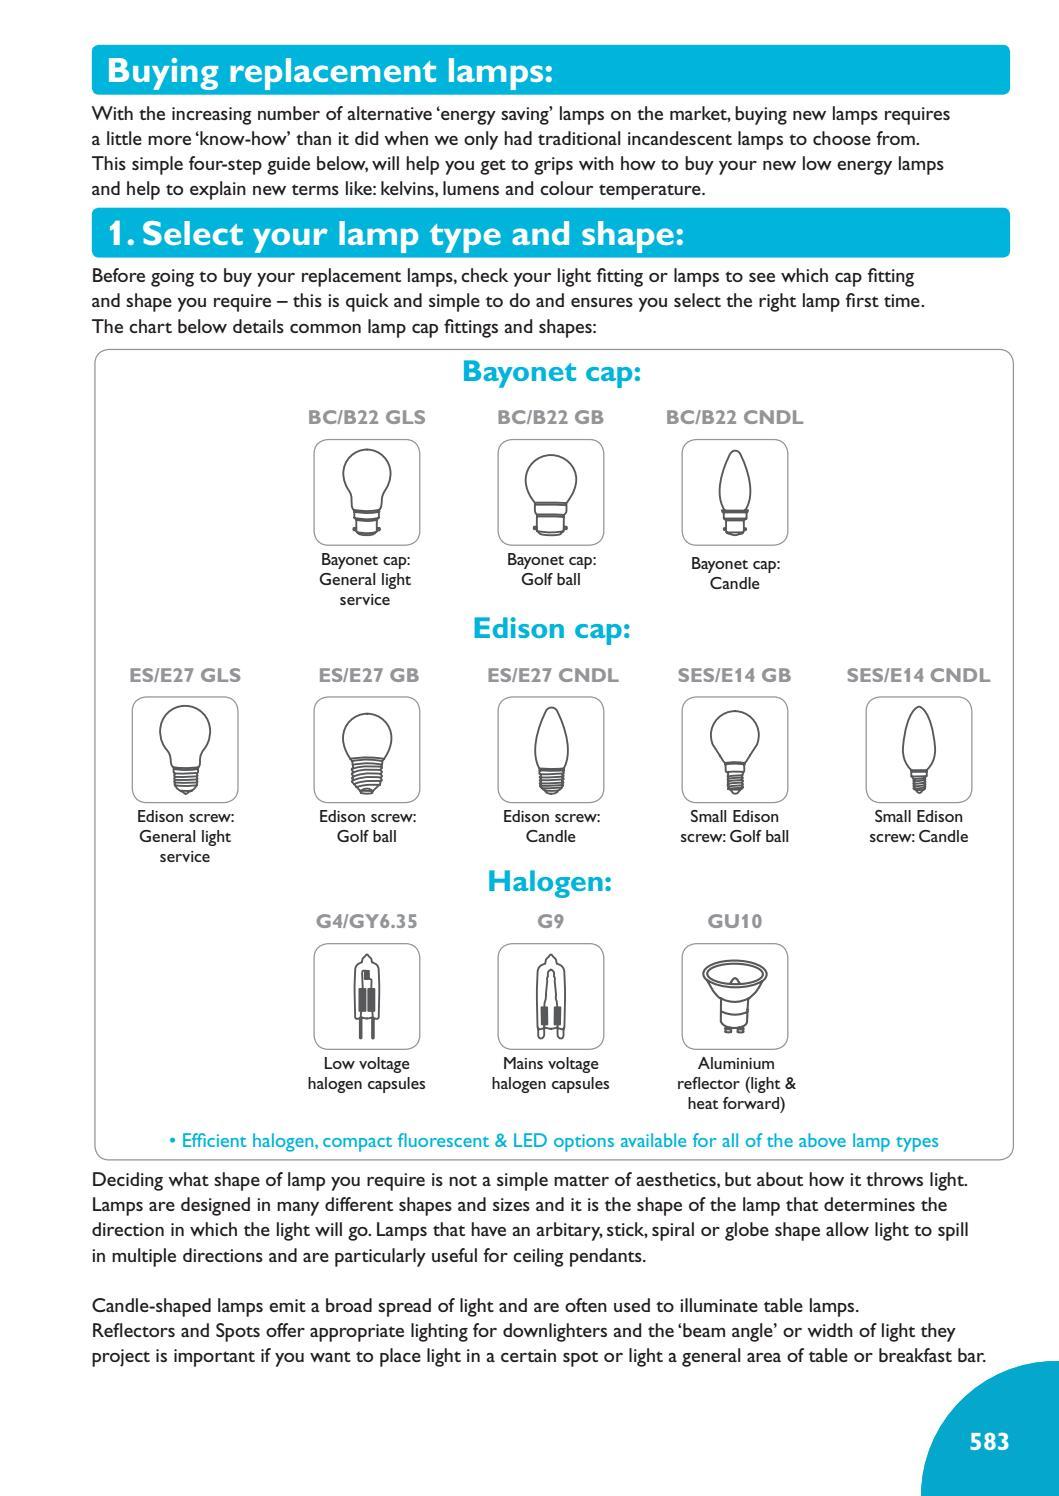 Dar Lighting Book Catalogue 2015/16 by KES Lighting - issuu